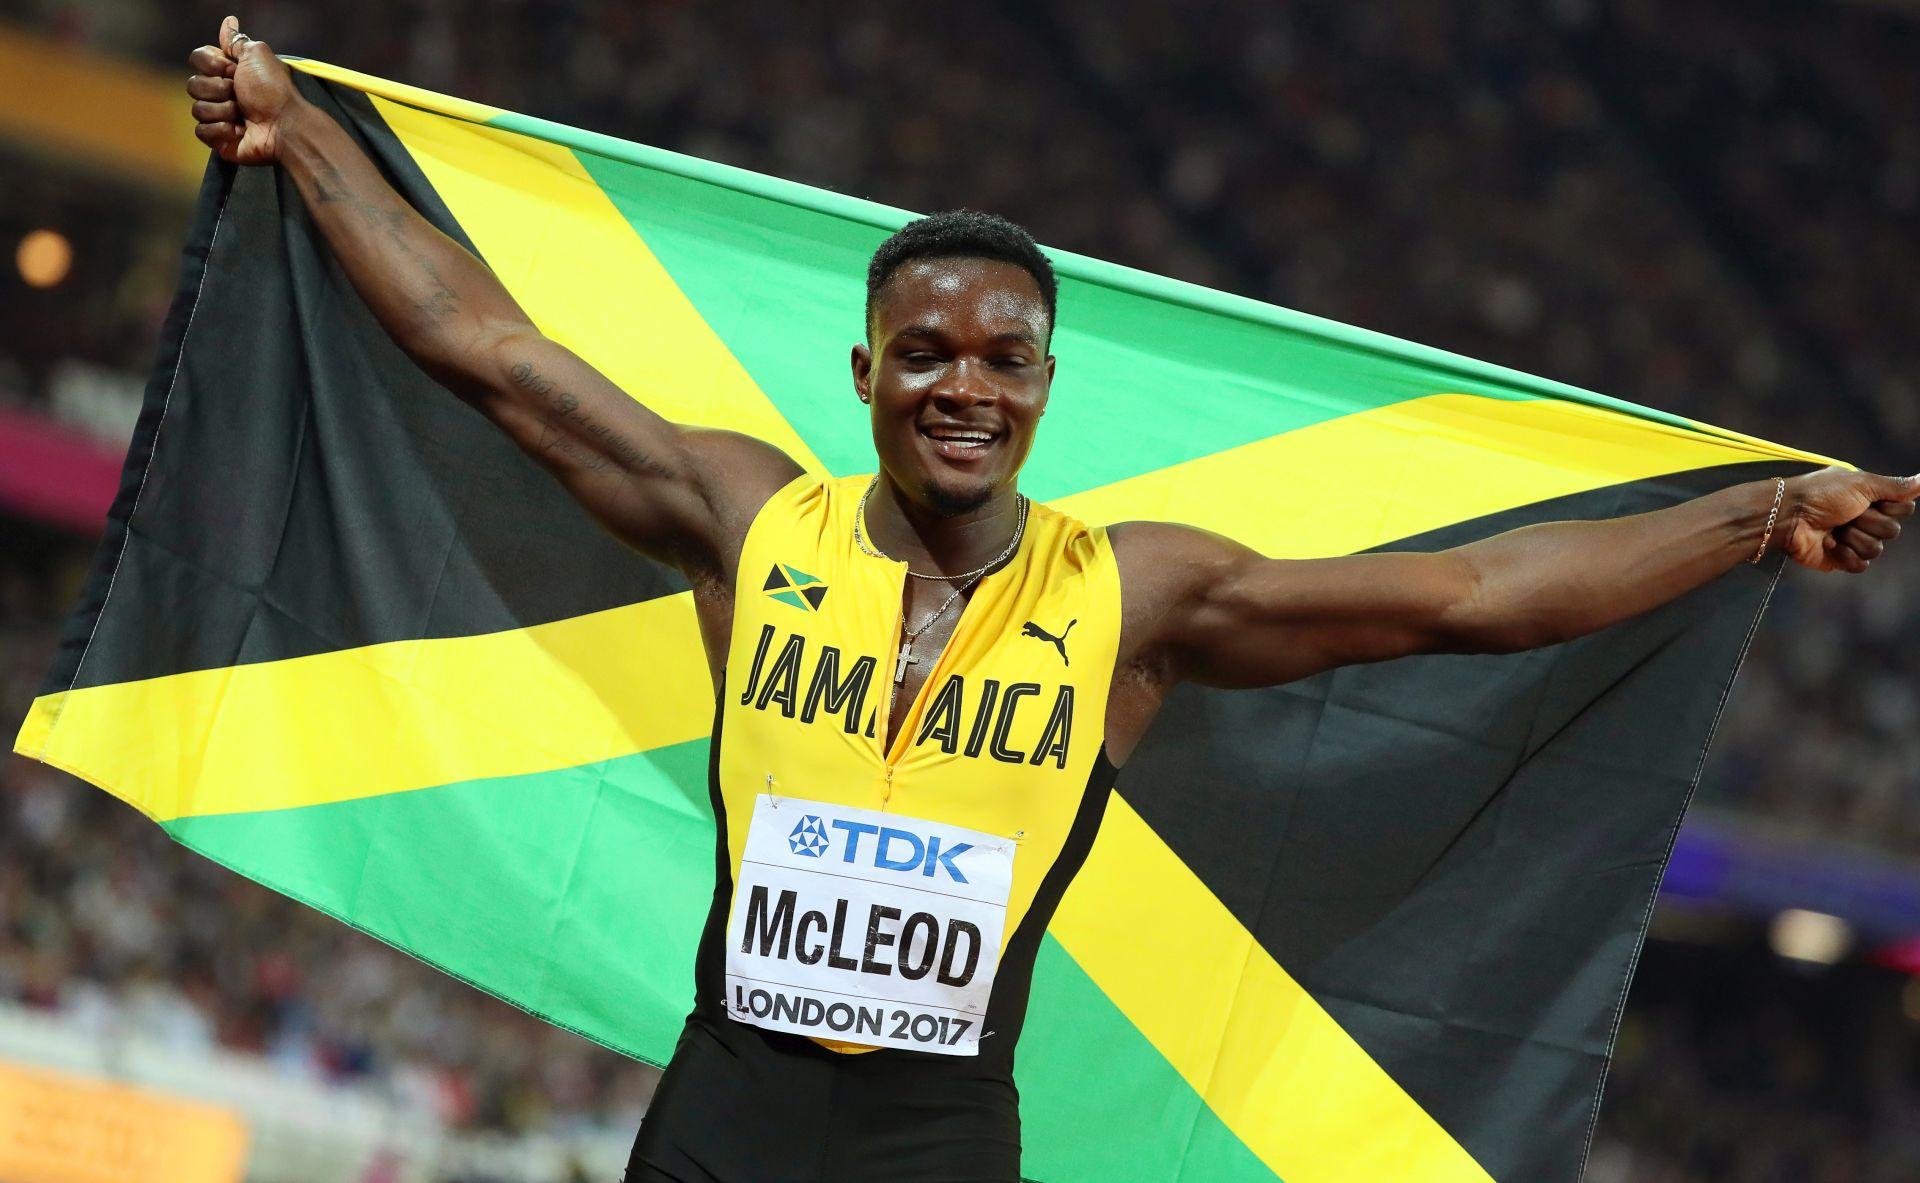 SP atletika: McLeod svjetski prvak na 110 m prepone, Rojas uzela ženski troskok